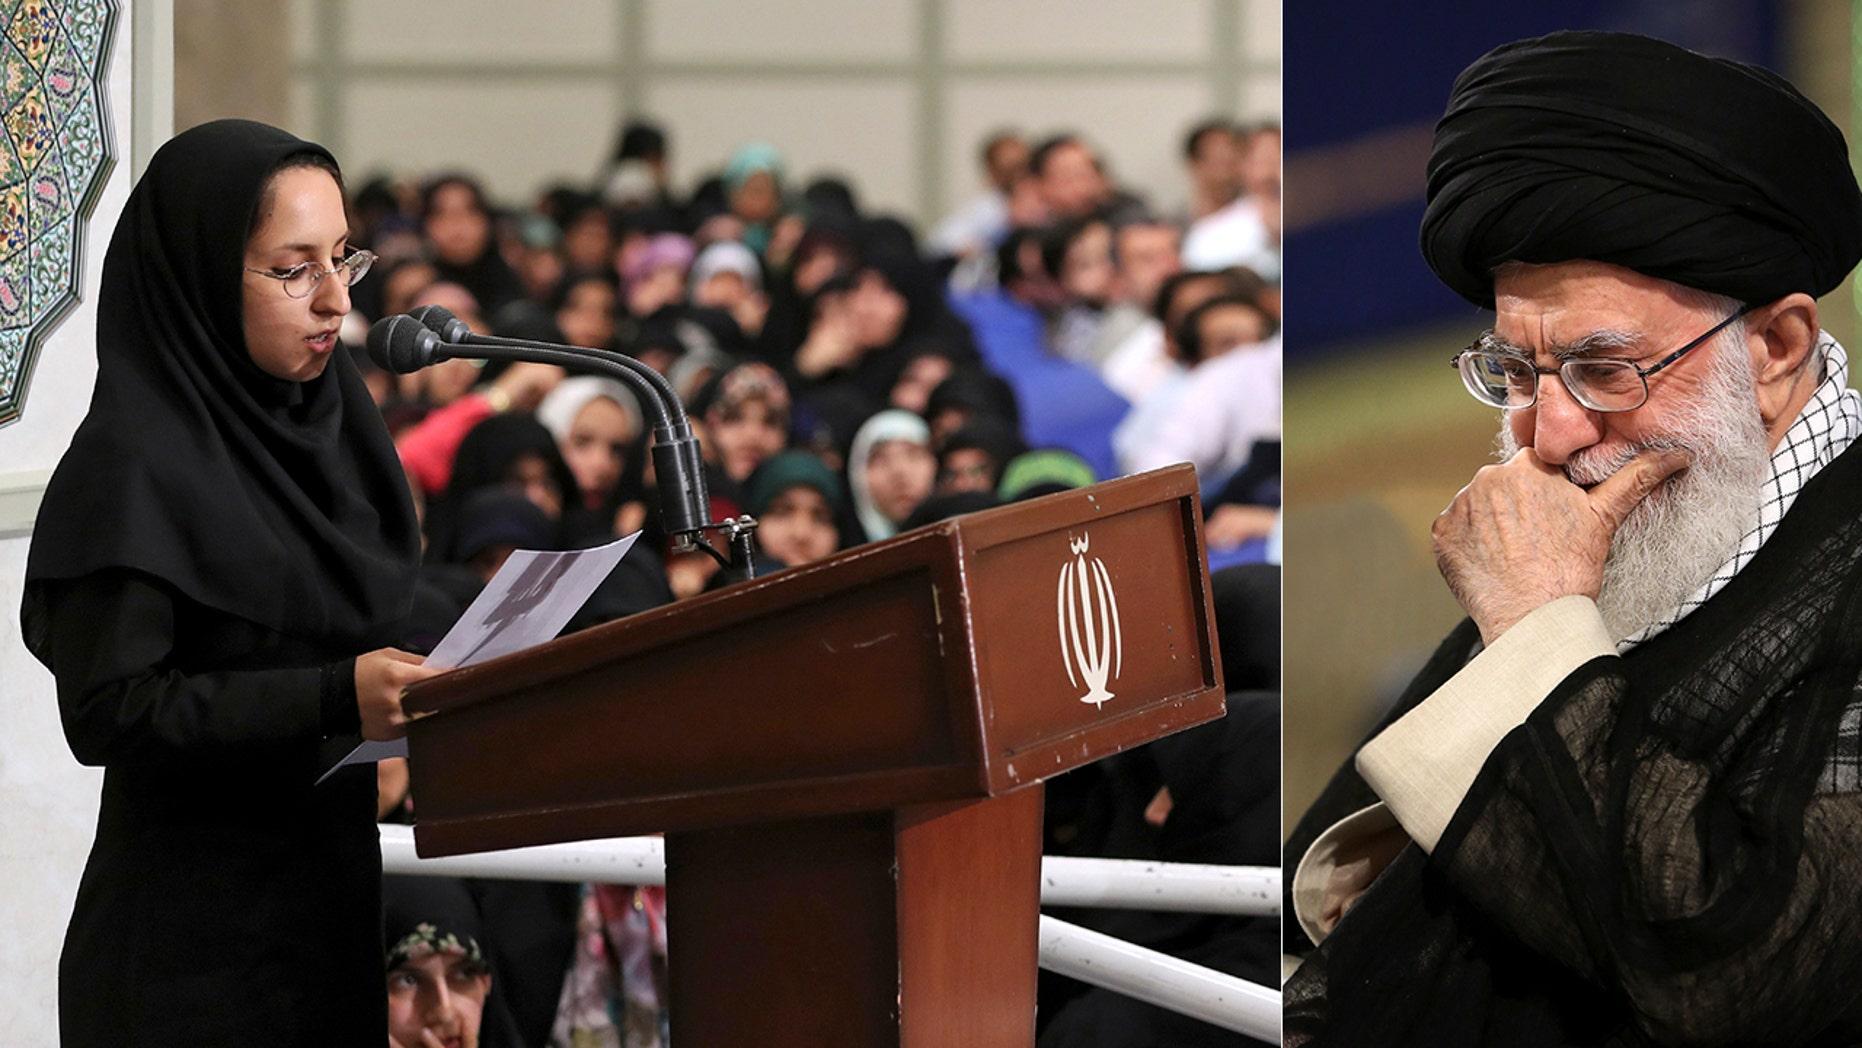 Sahar Mehrabi, left, reads her speech during a meeting with Supreme Leader Ayatollah Khamenei in Tehran, Iran.